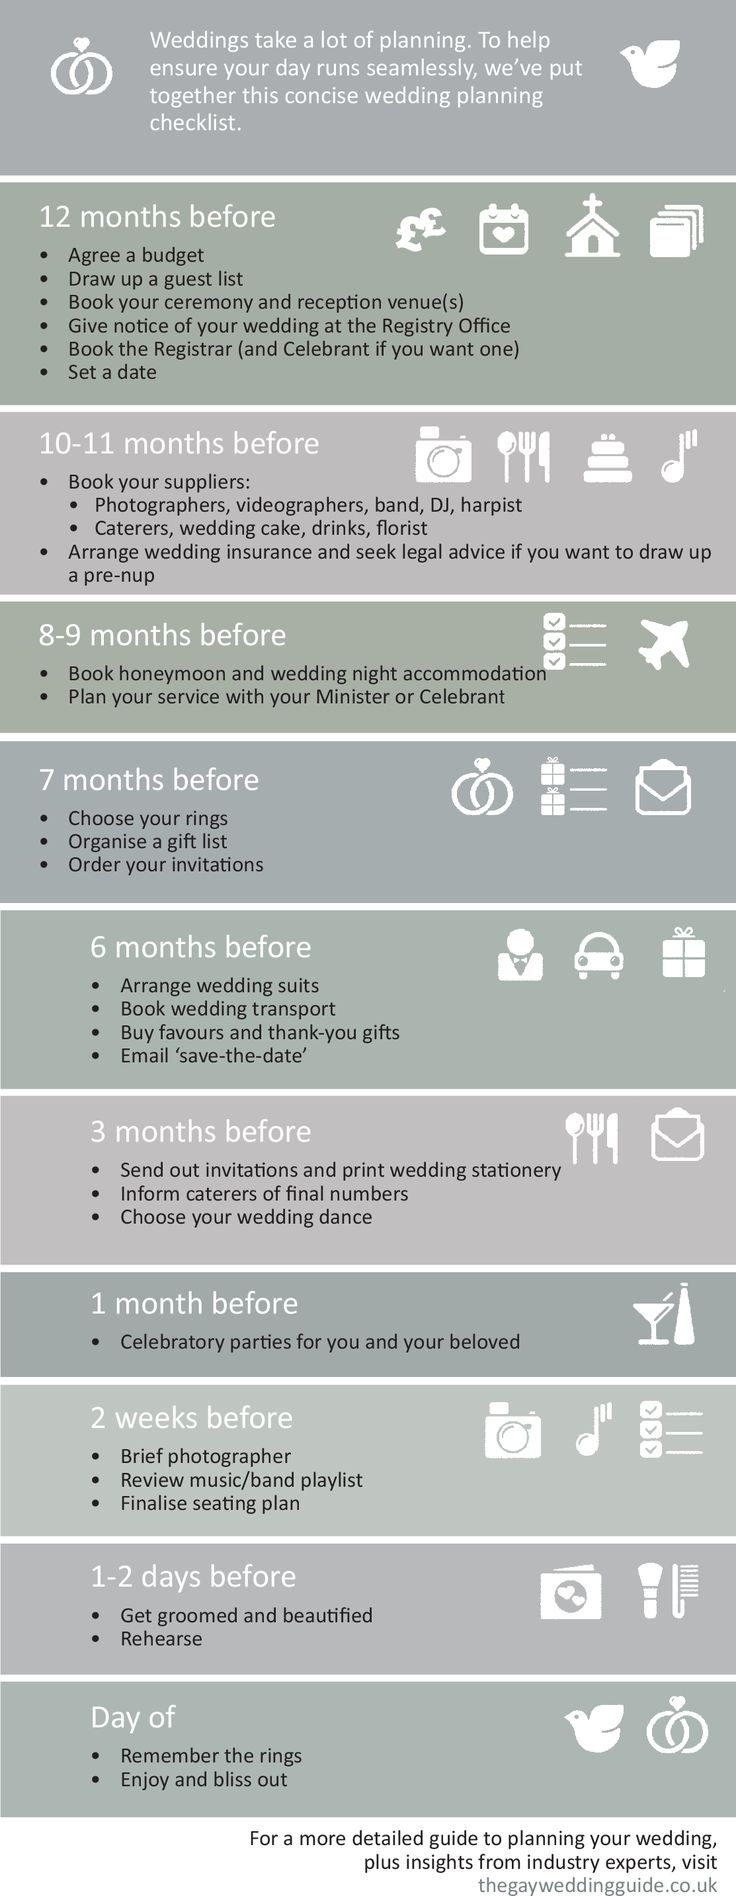 17 Best ideas about Wedding Checklist Printable on Pinterest ...